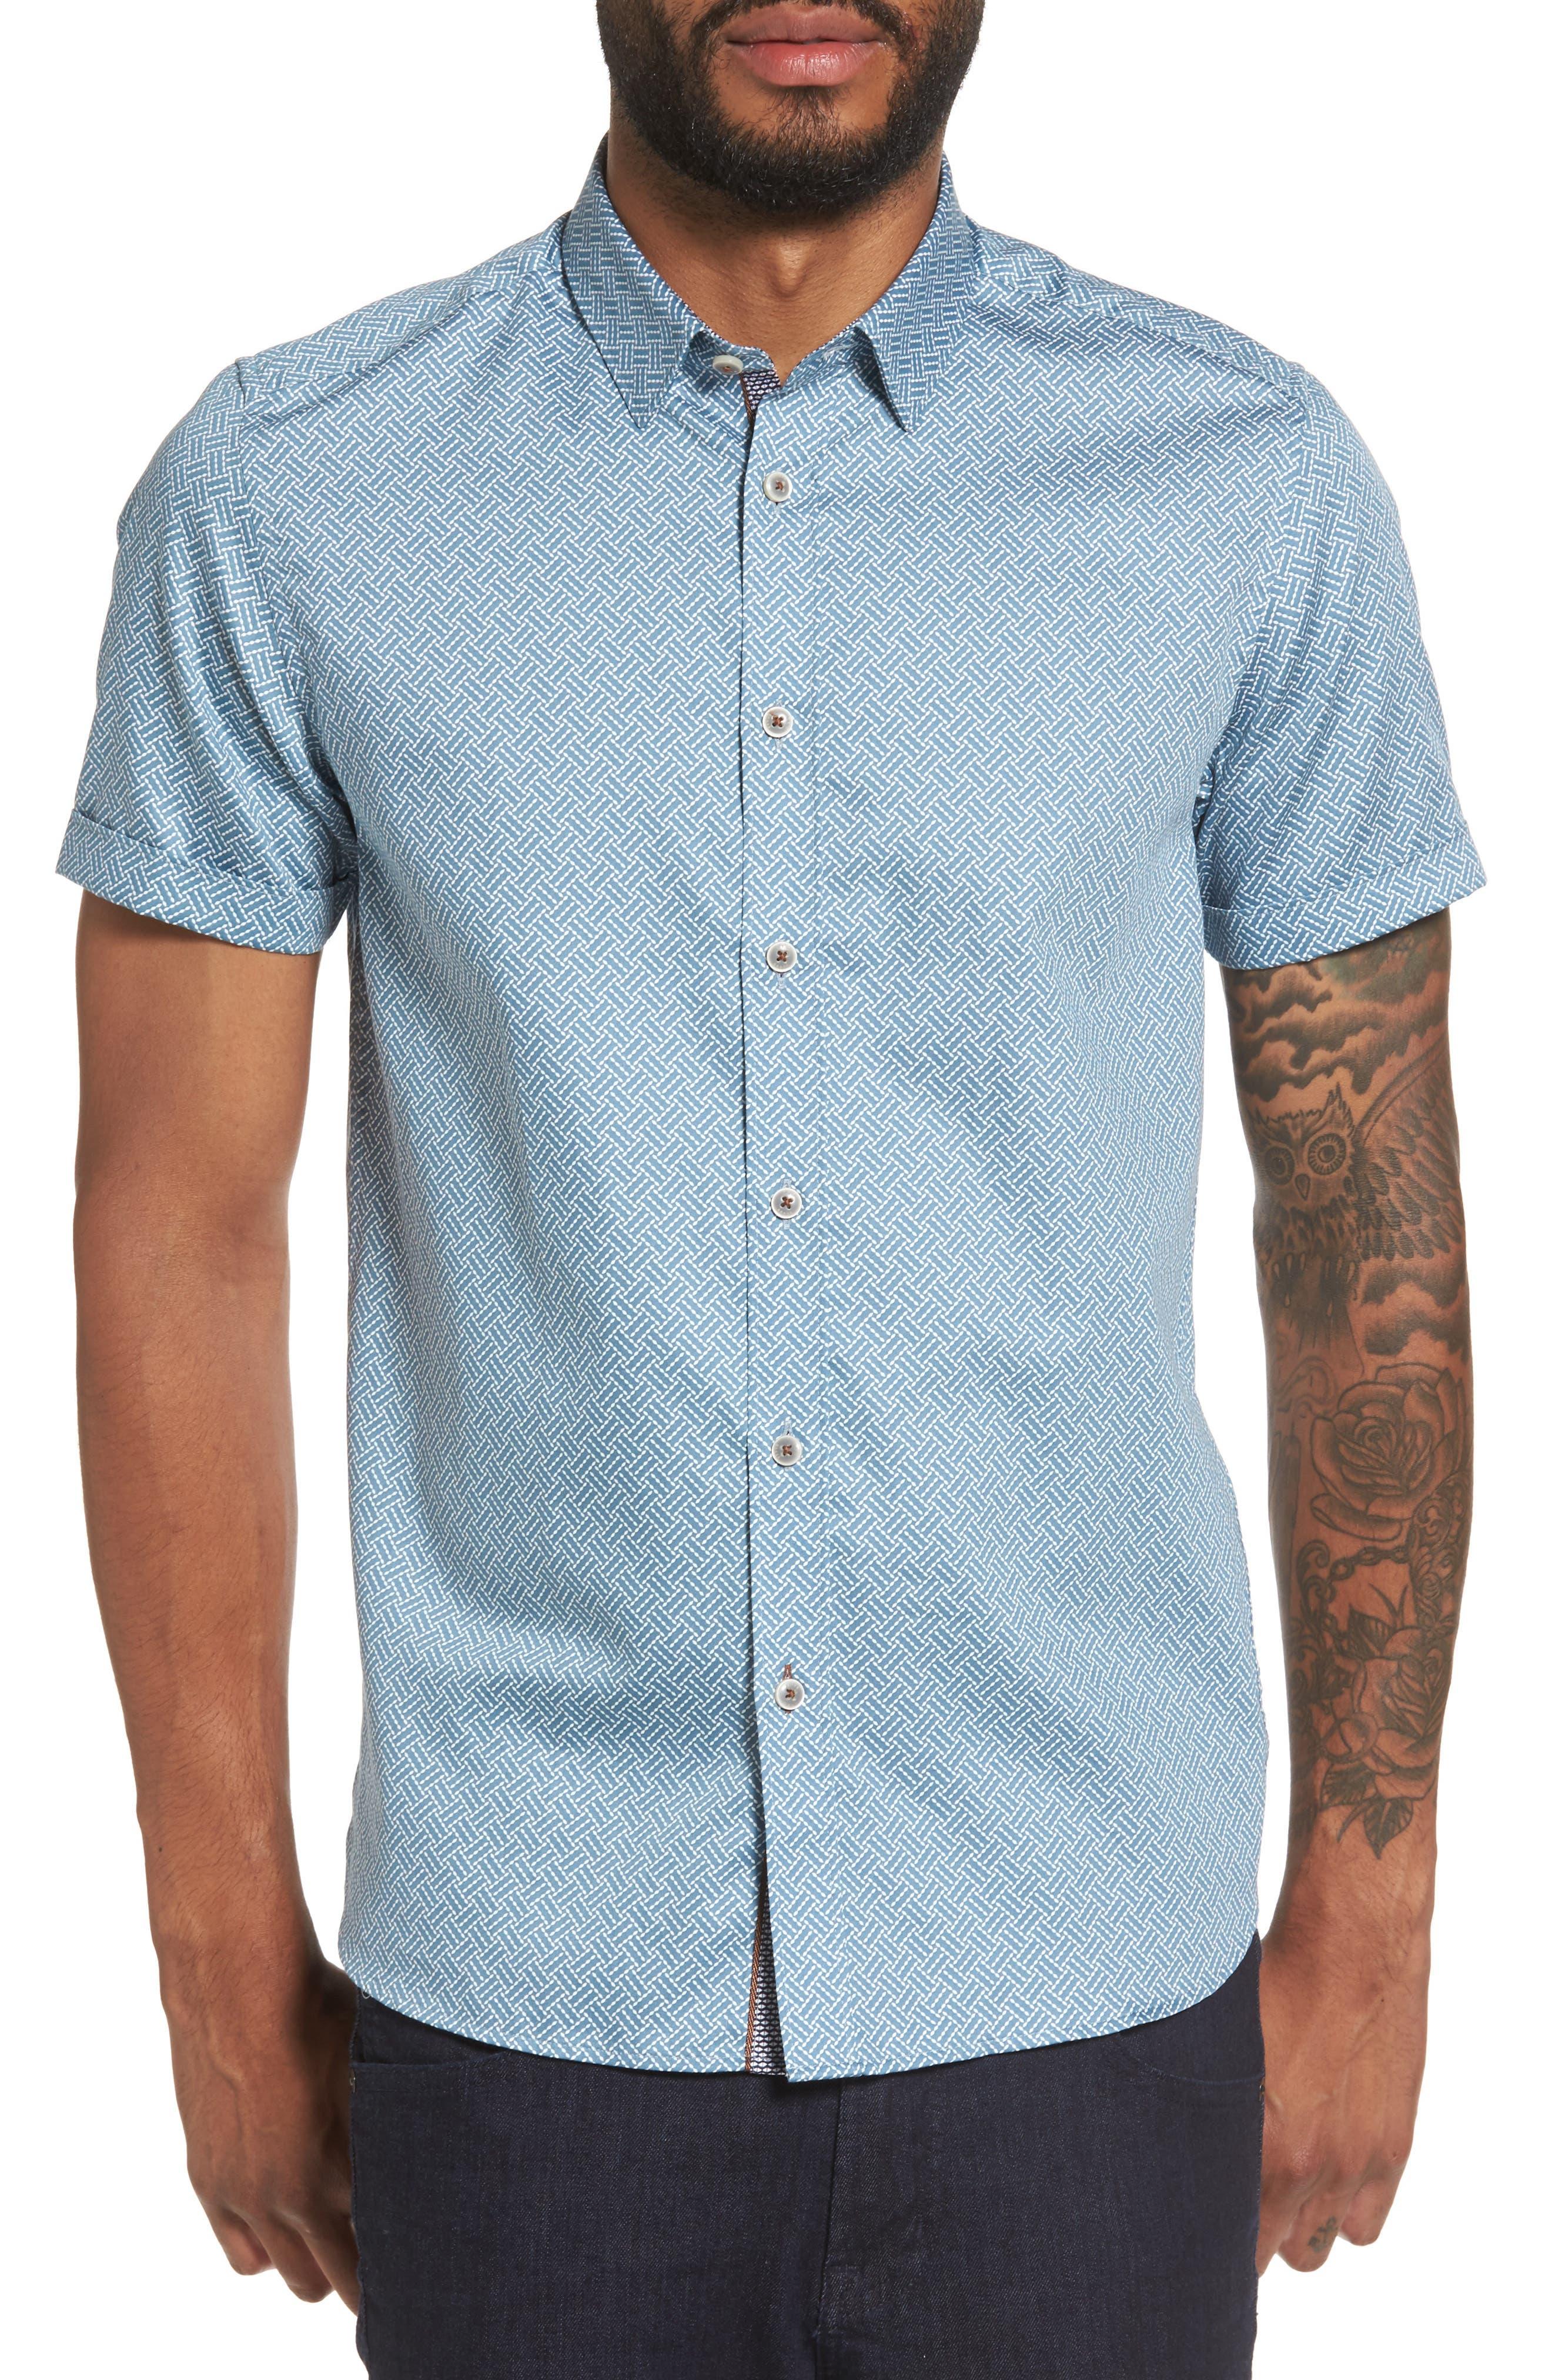 Lashore Basketweave Print Woven Shirt,                         Main,                         color, Blue